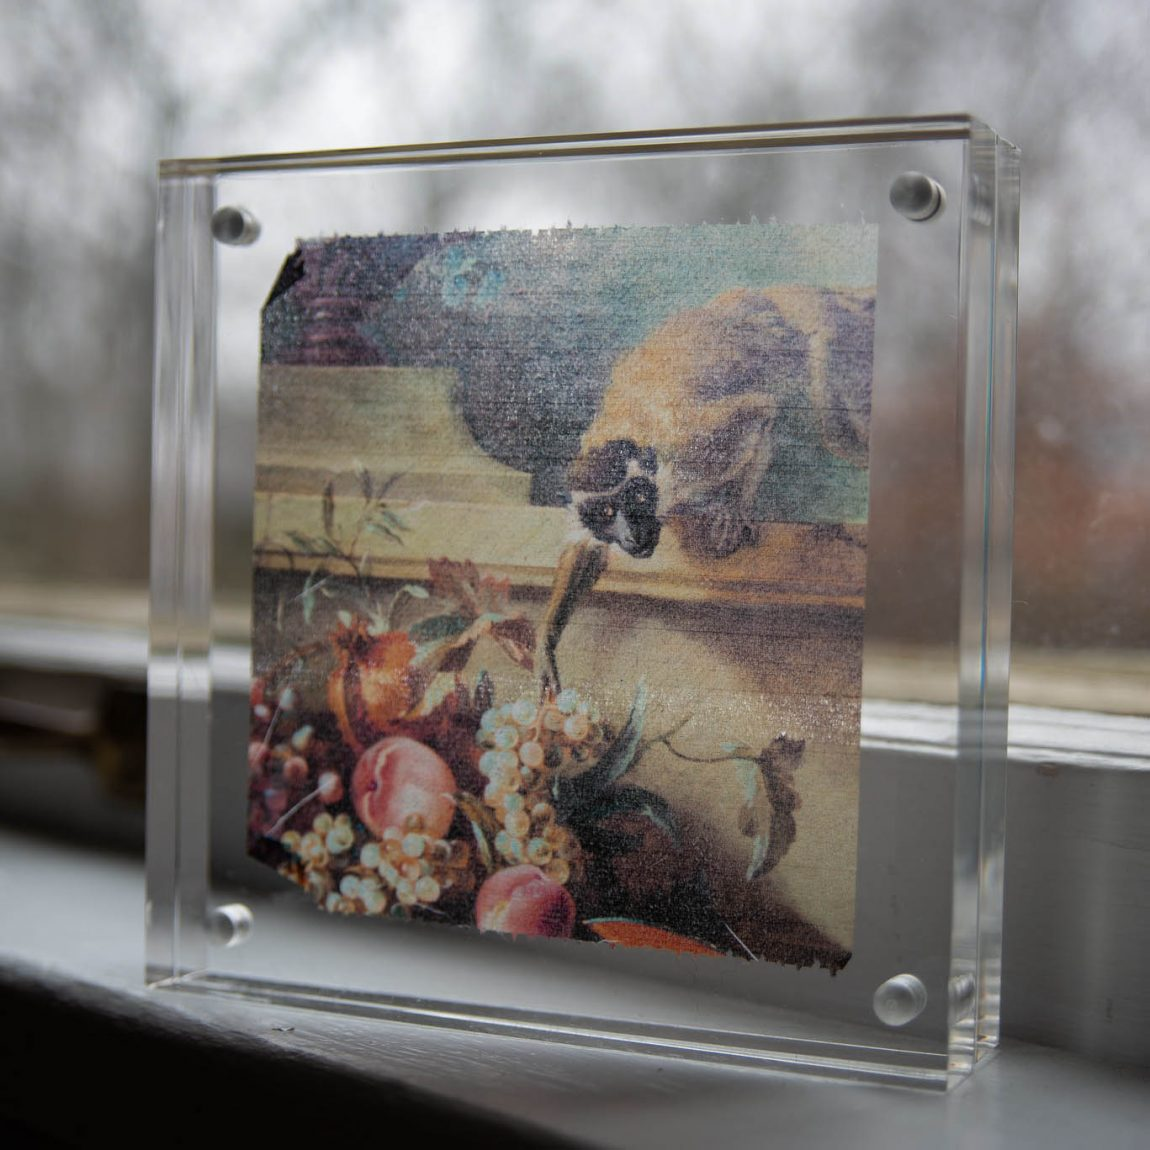 Toilet paper art print inside acrylic frame